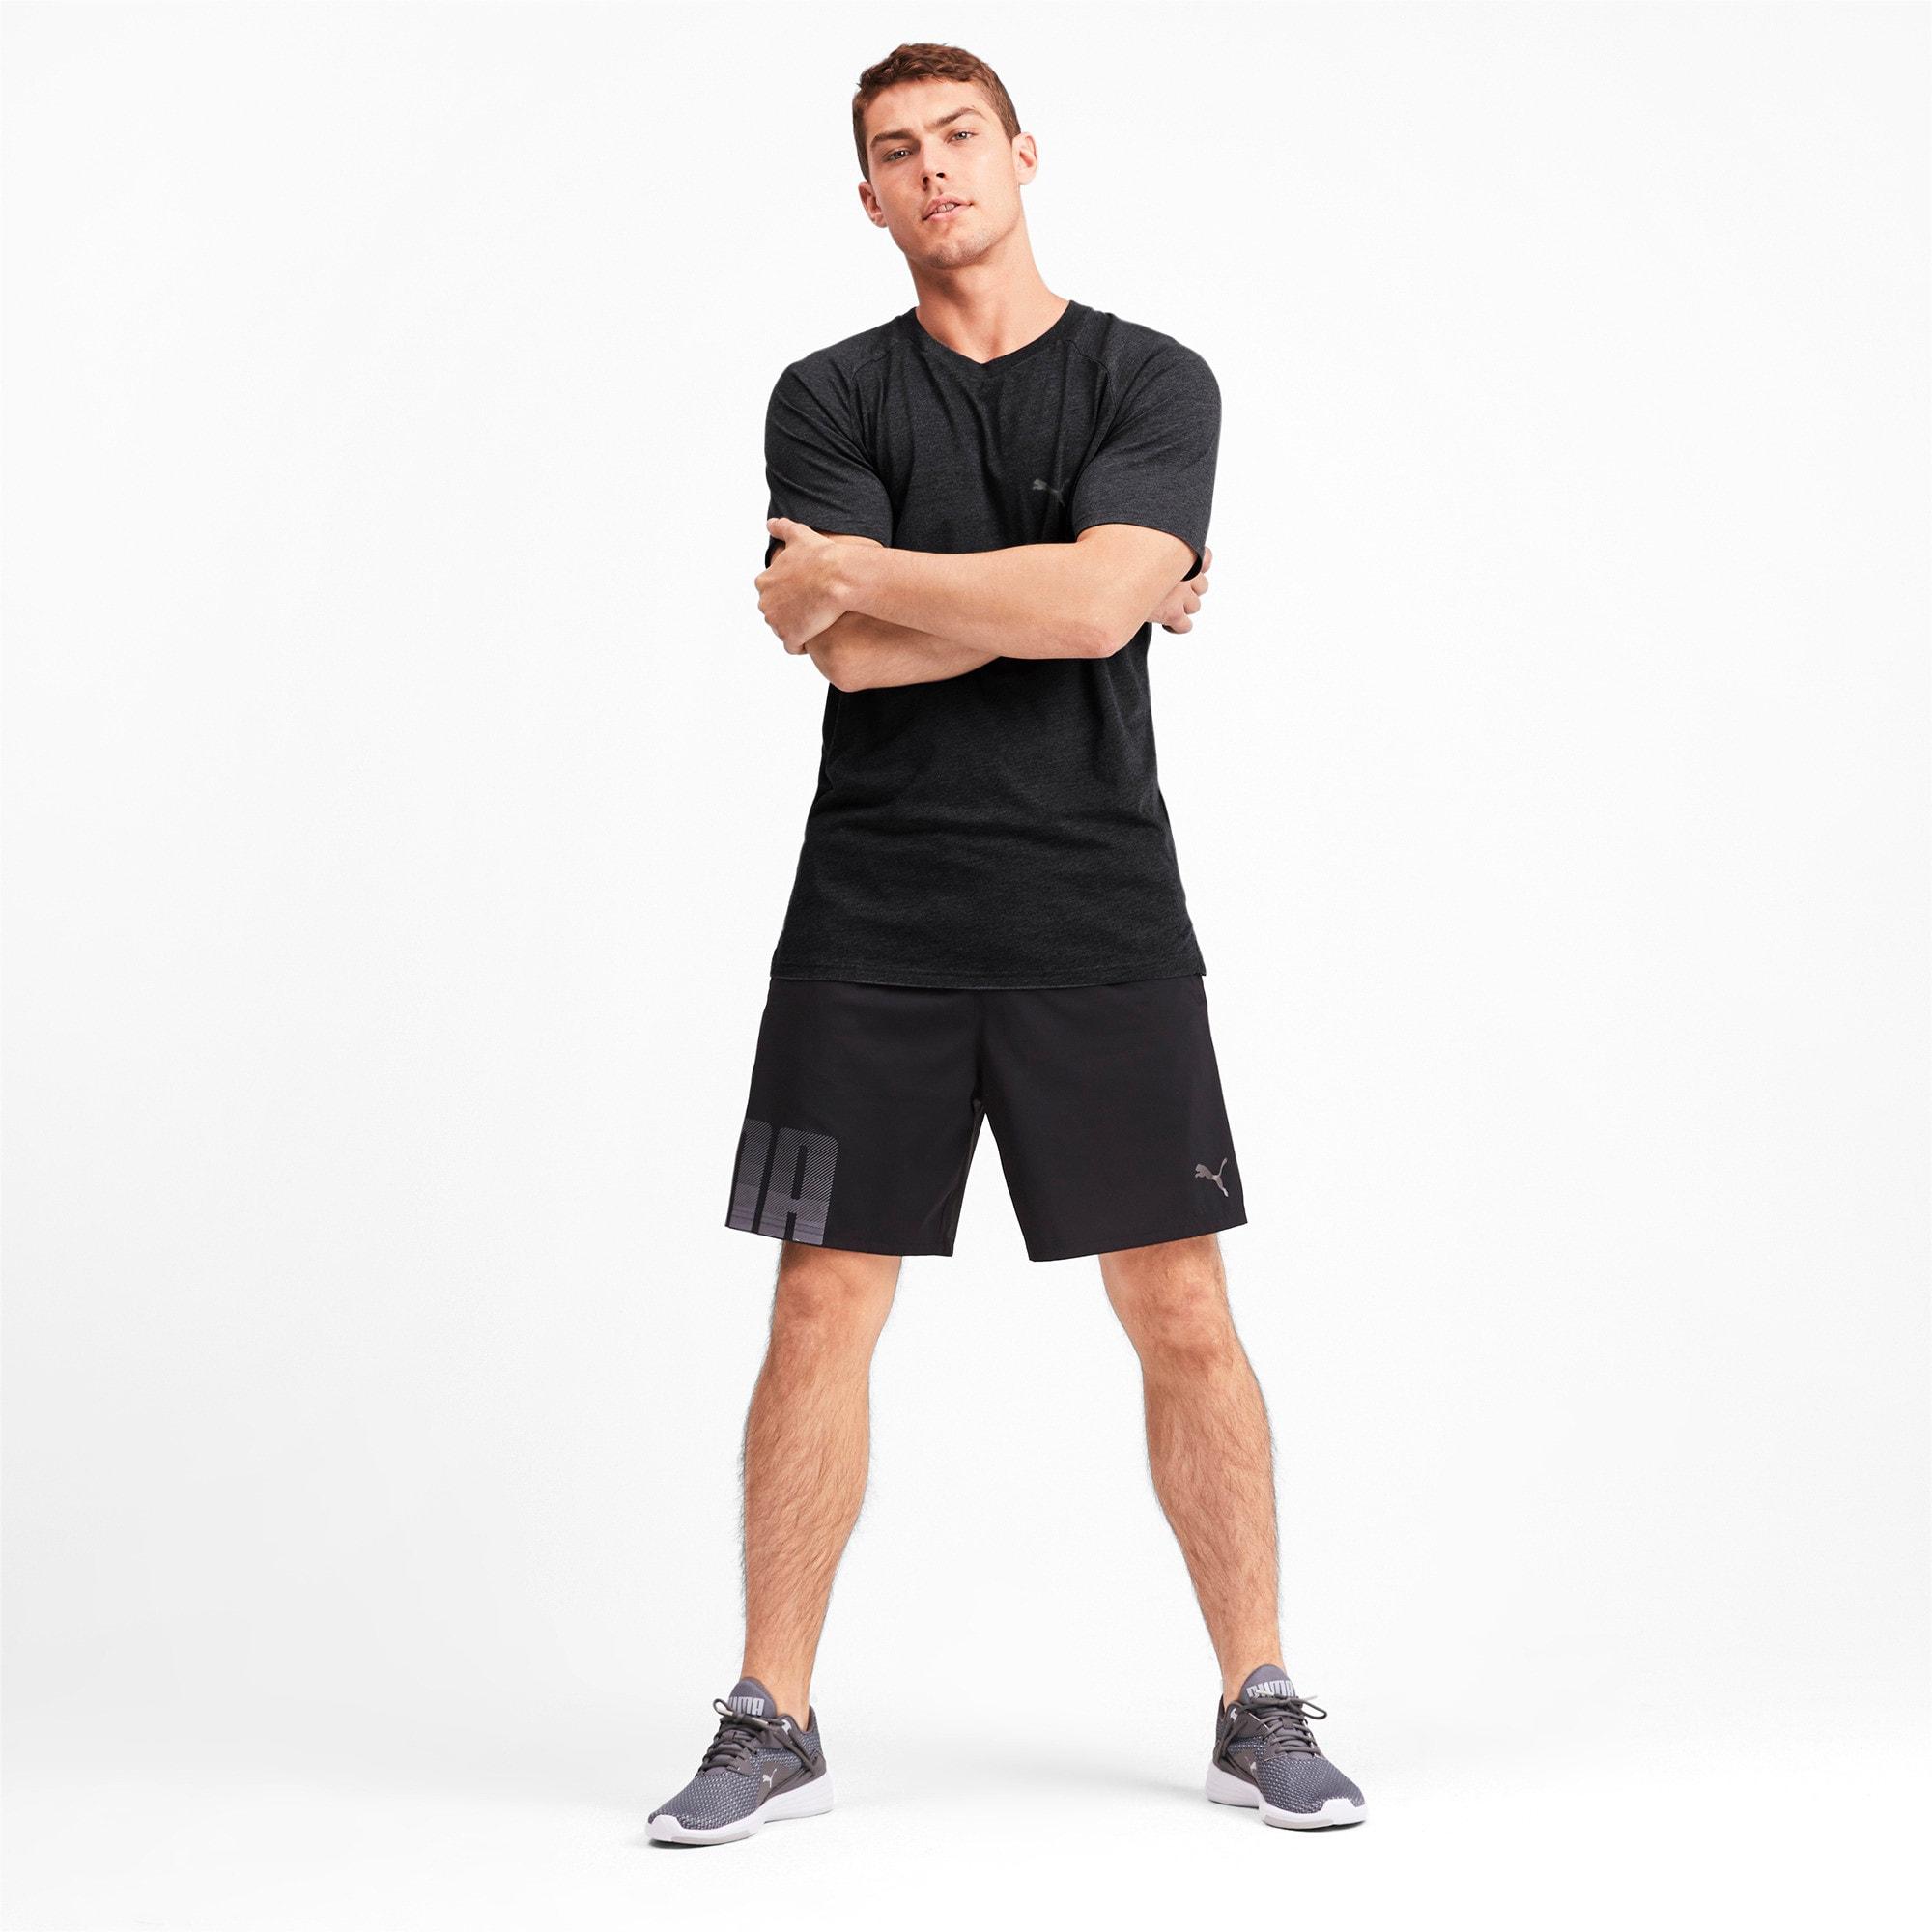 Thumbnail 3 of Meska koszulka Reactive treningowa z krótkim rekawem, Puma Black Heather, medium